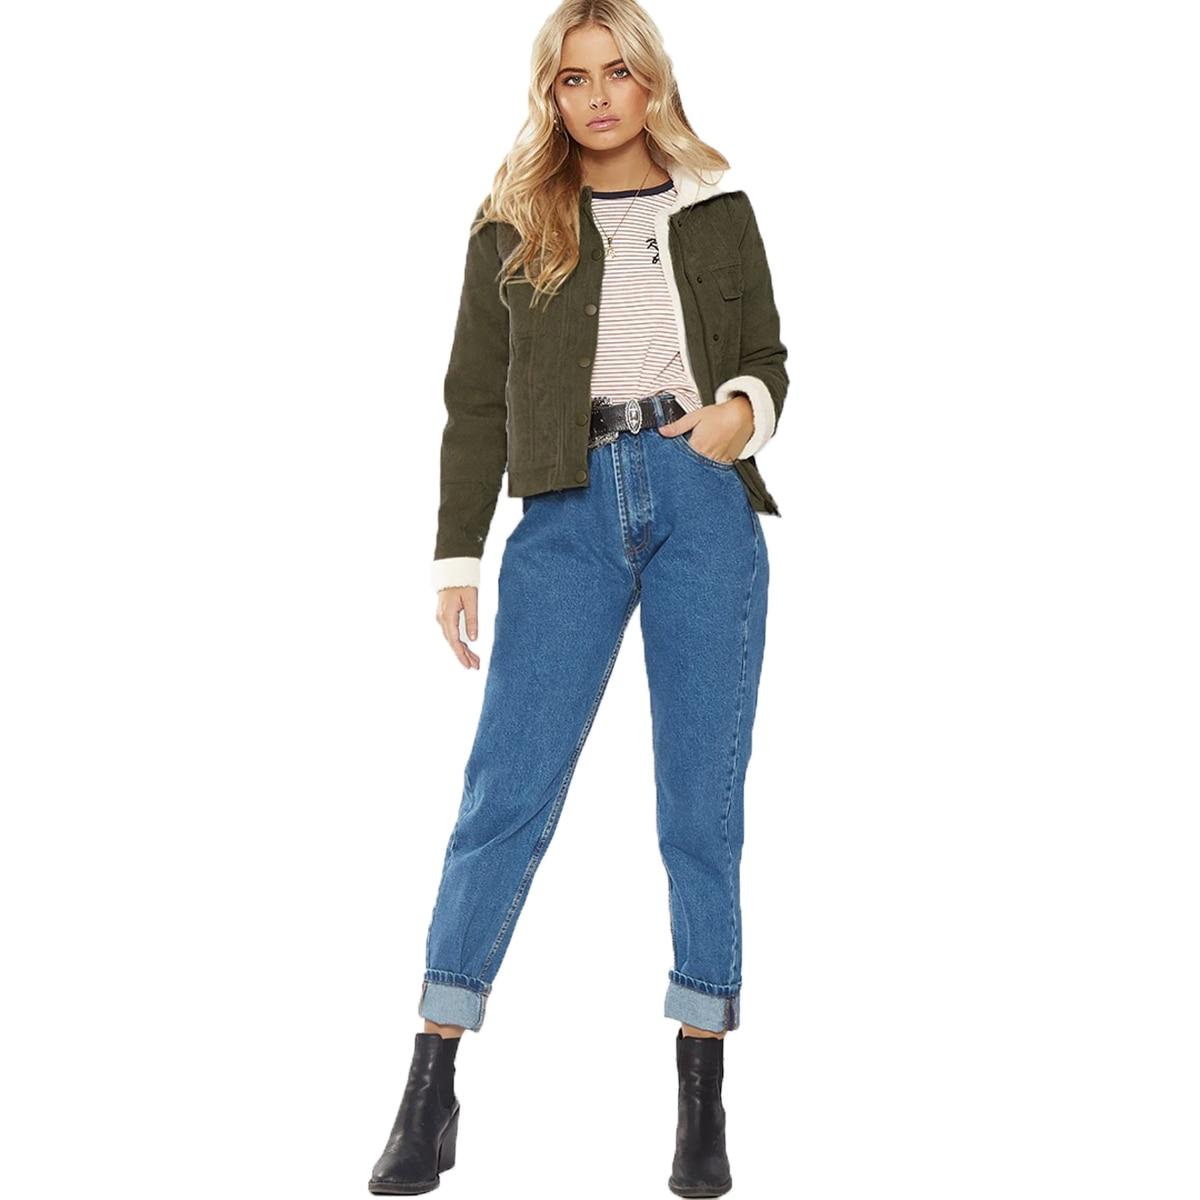 2018 Army Green Corduroy Tie Hair Short Jacket New Style Fashion